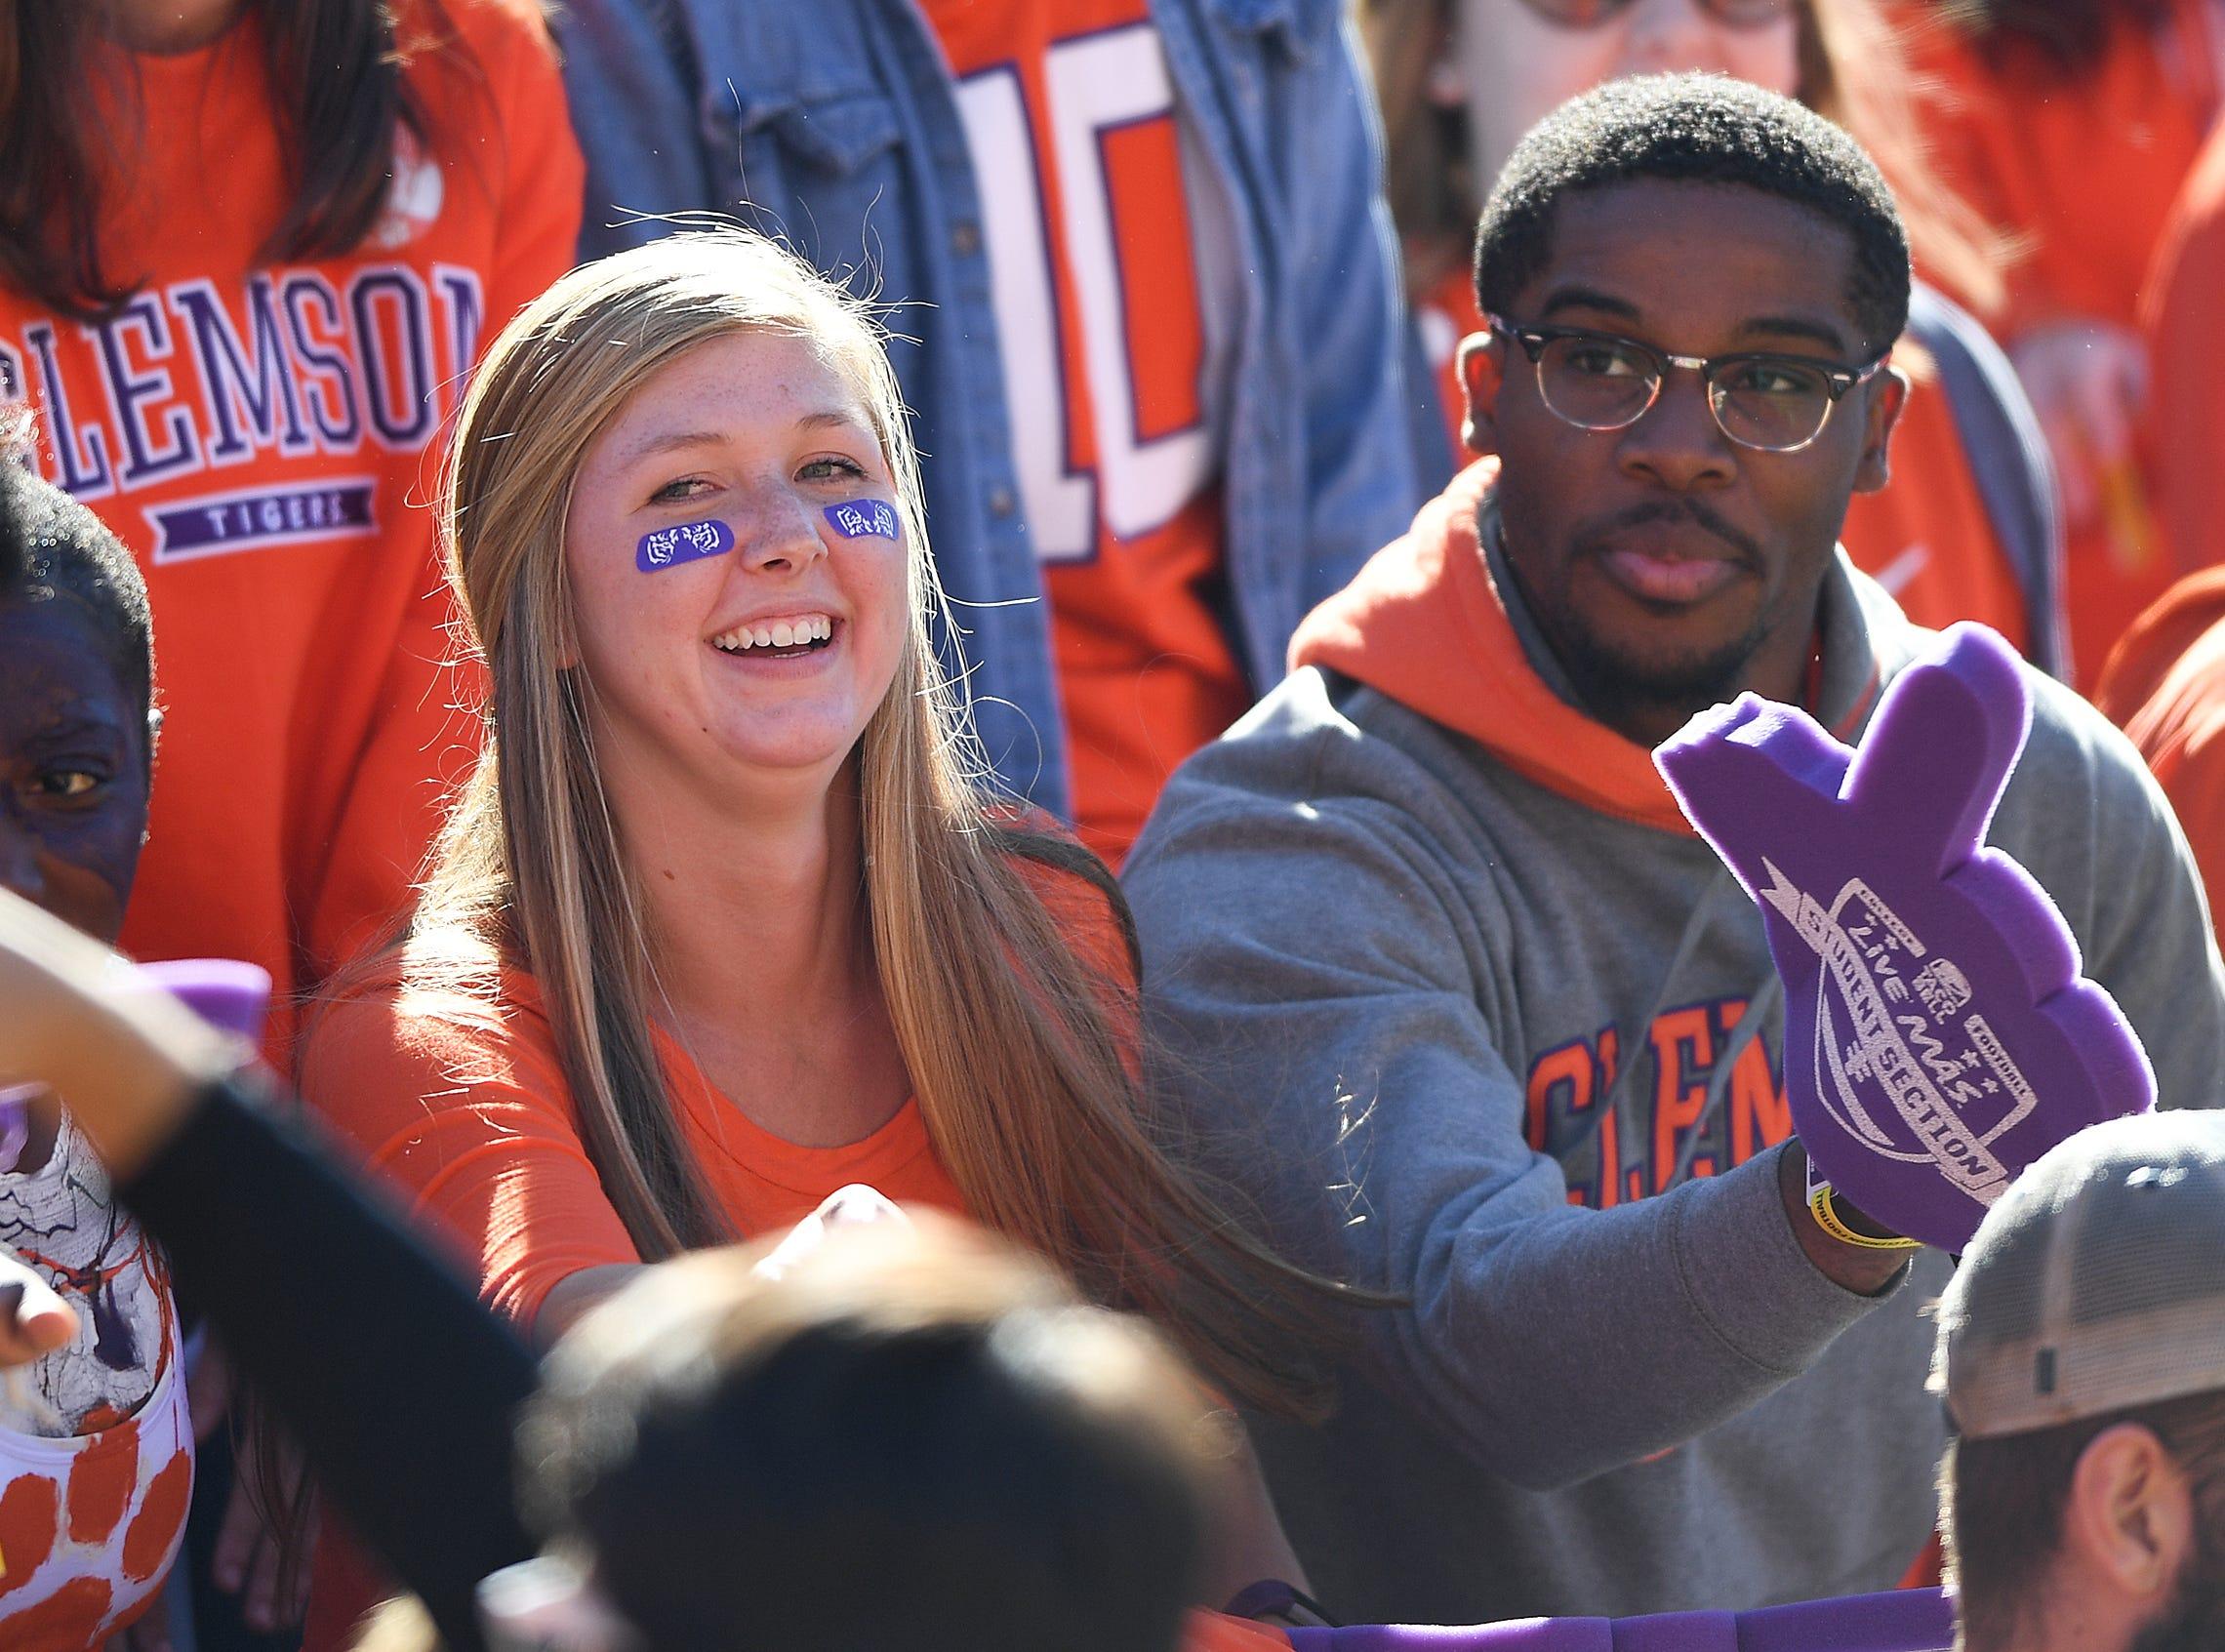 Clemson fans during the 3rd quarter Saturday, November 3, 2018 at Clemson's Memorial Stadium.